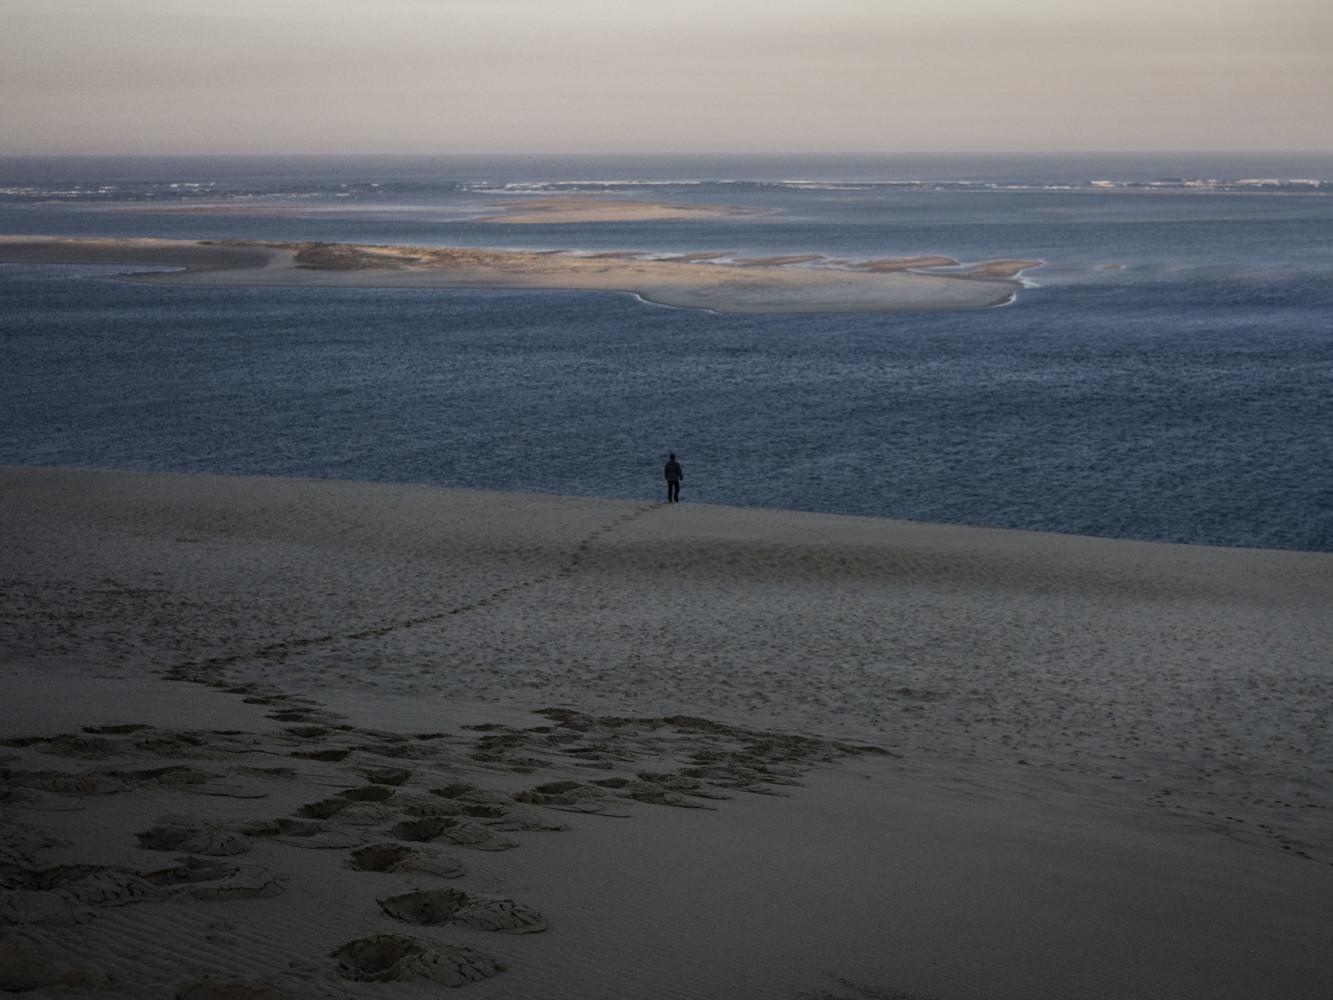 The Geometry of Emptiness: A Journey Through France's 'Diagonale du Vide' • Antoine d'Agata